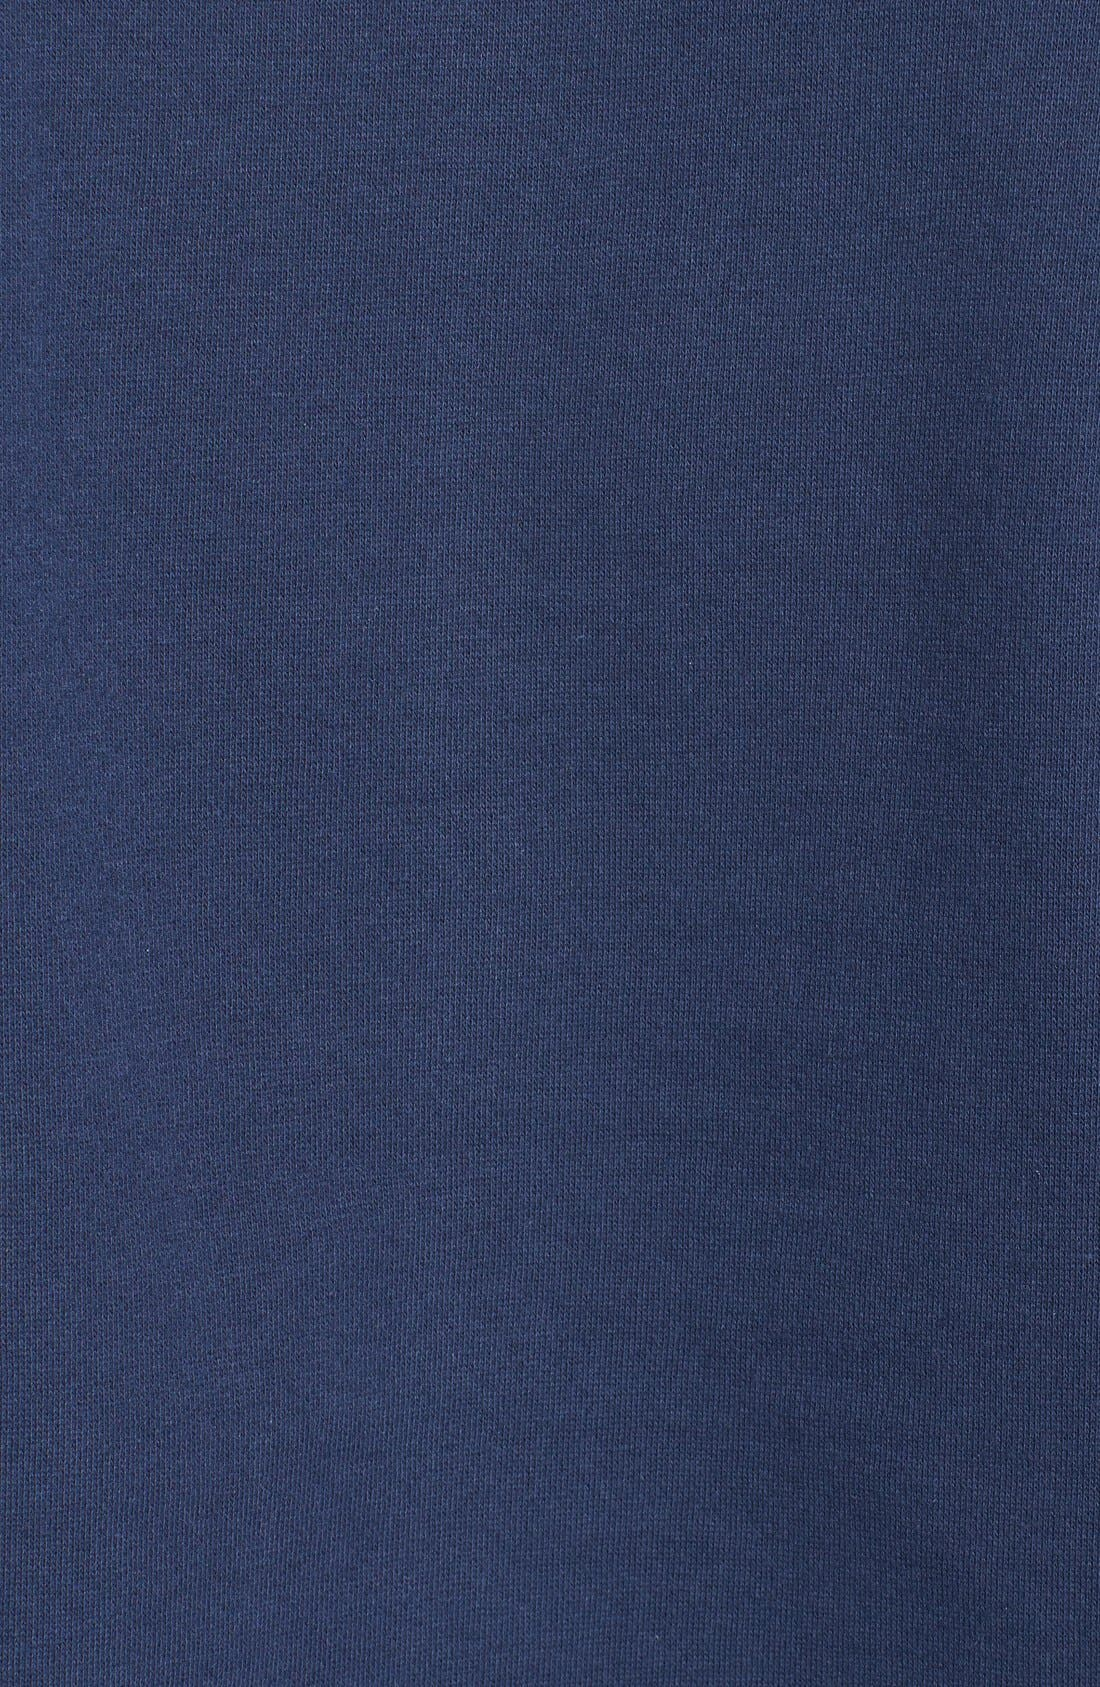 Alternate Image 3  - Mitchell & Ness 'St. Louis Cardinals' Crewneck Sweatshirt